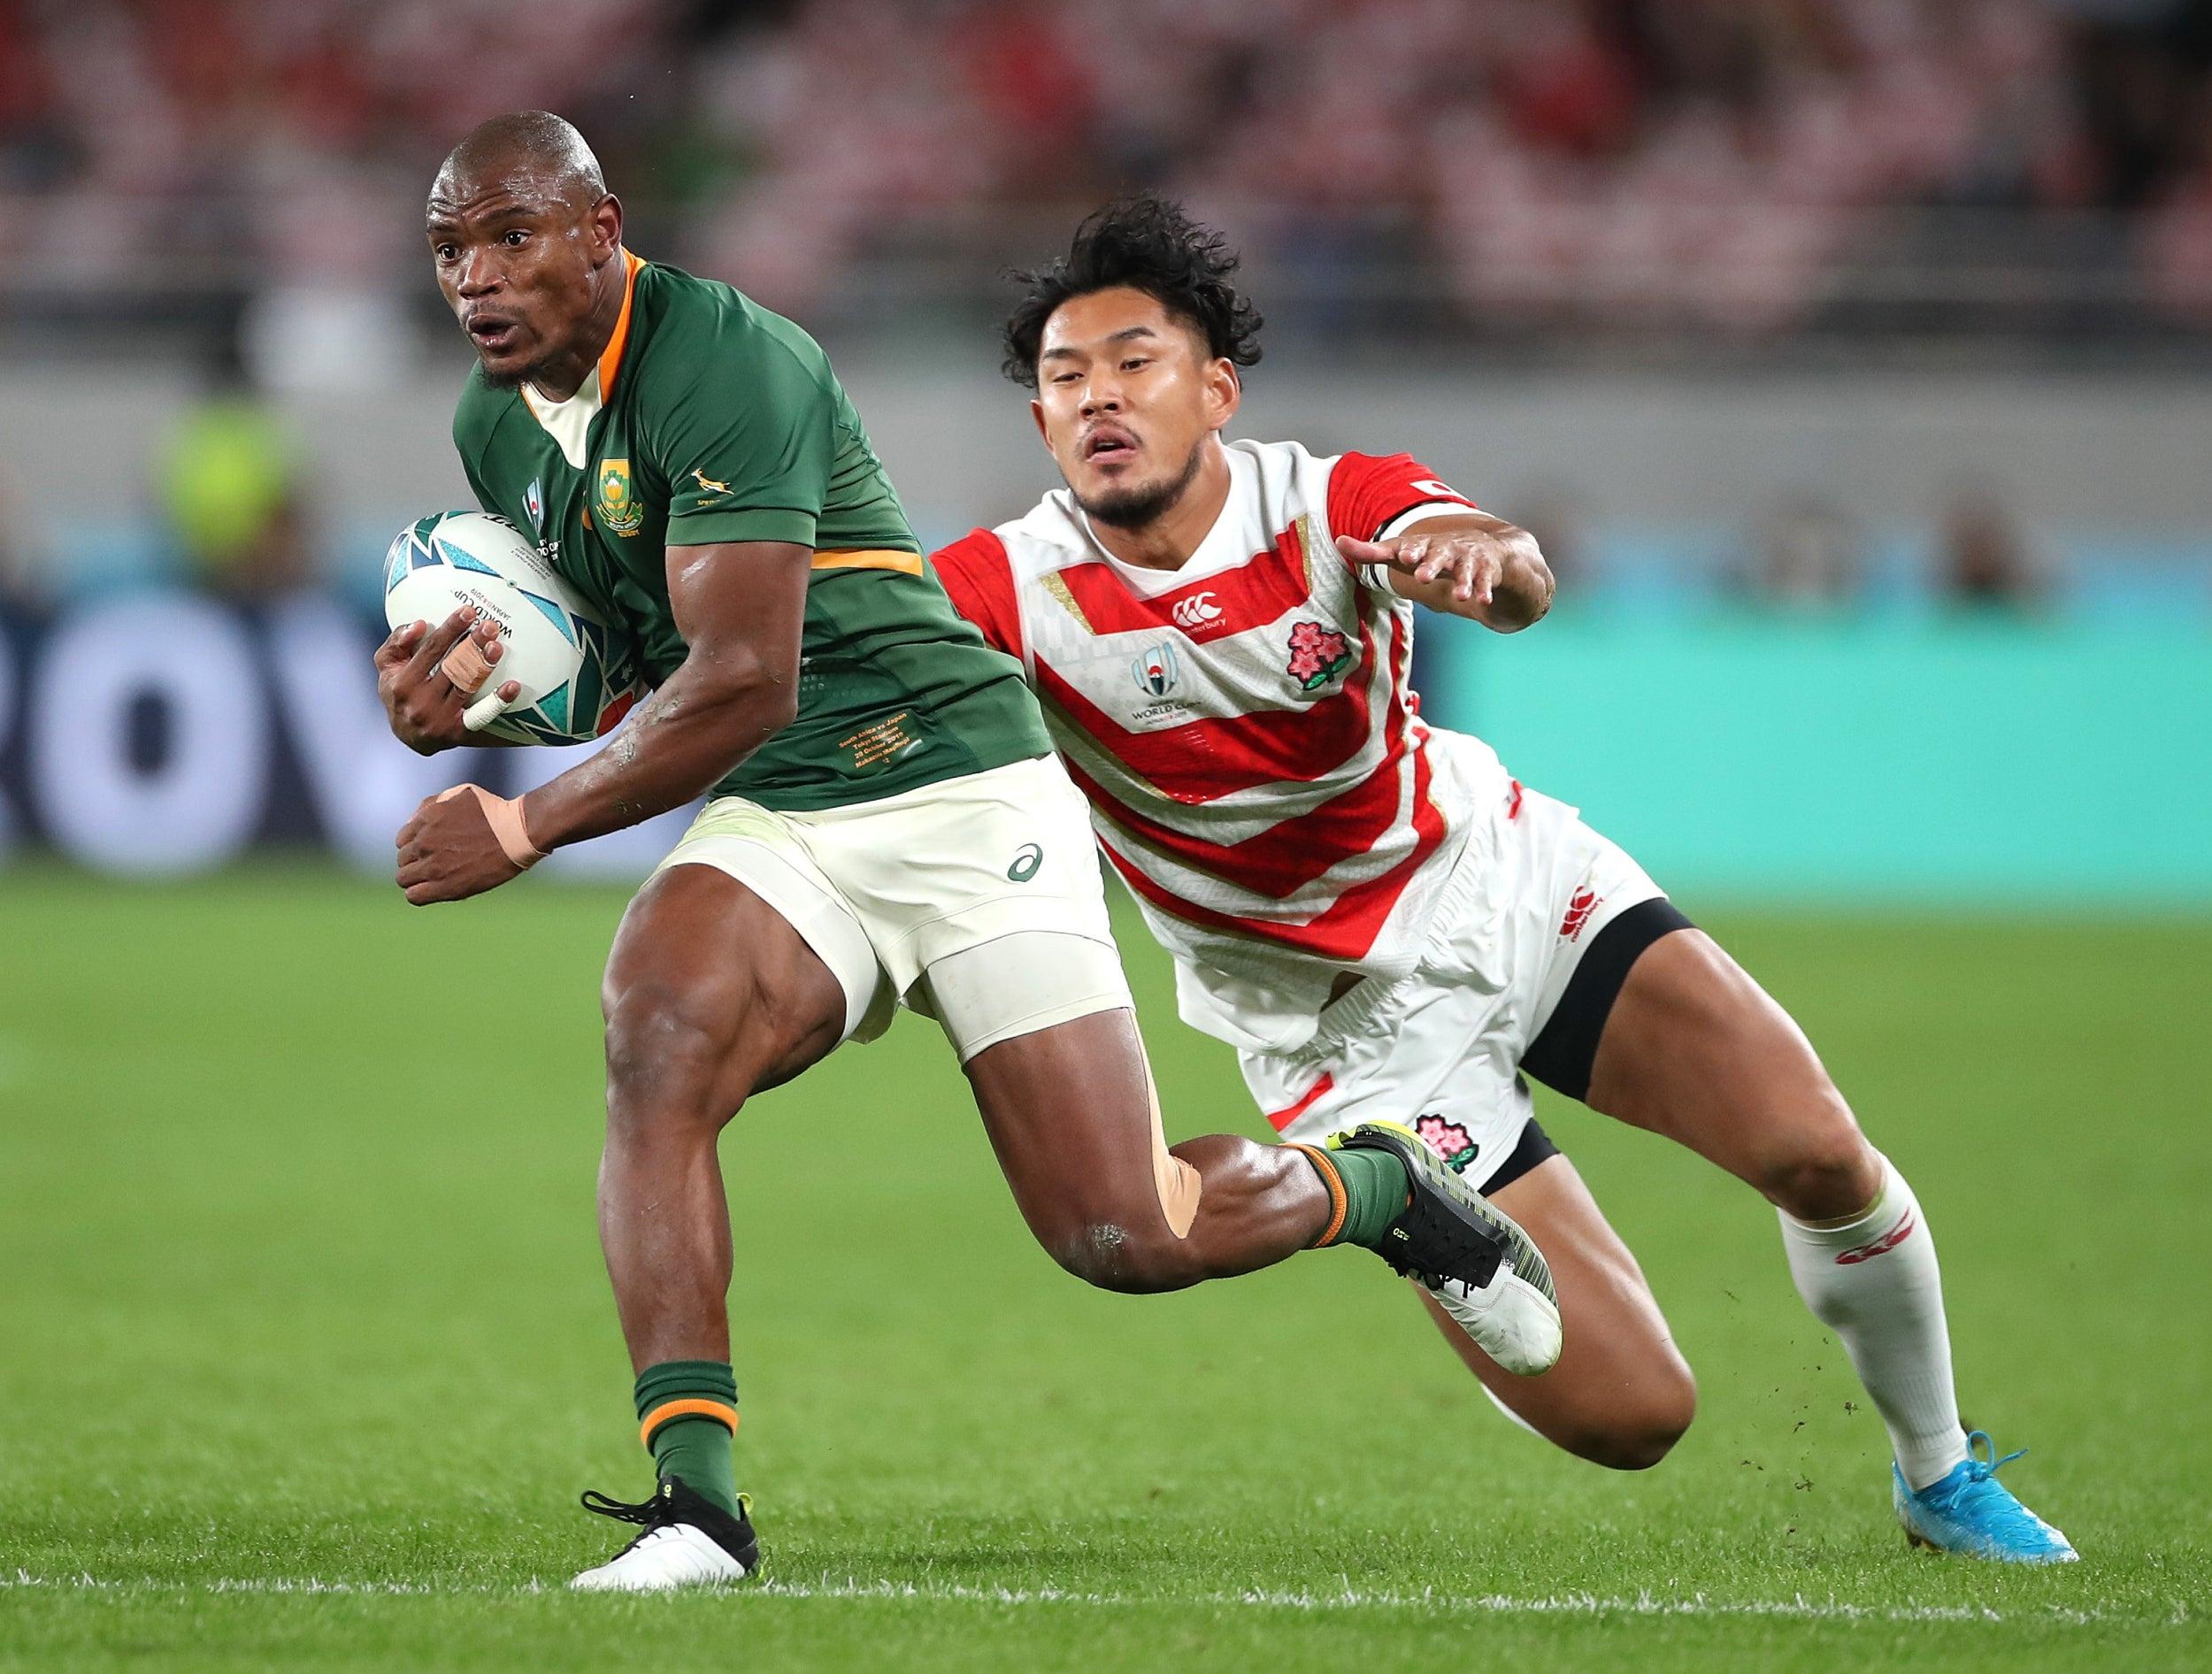 japan vs south africa - photo #15